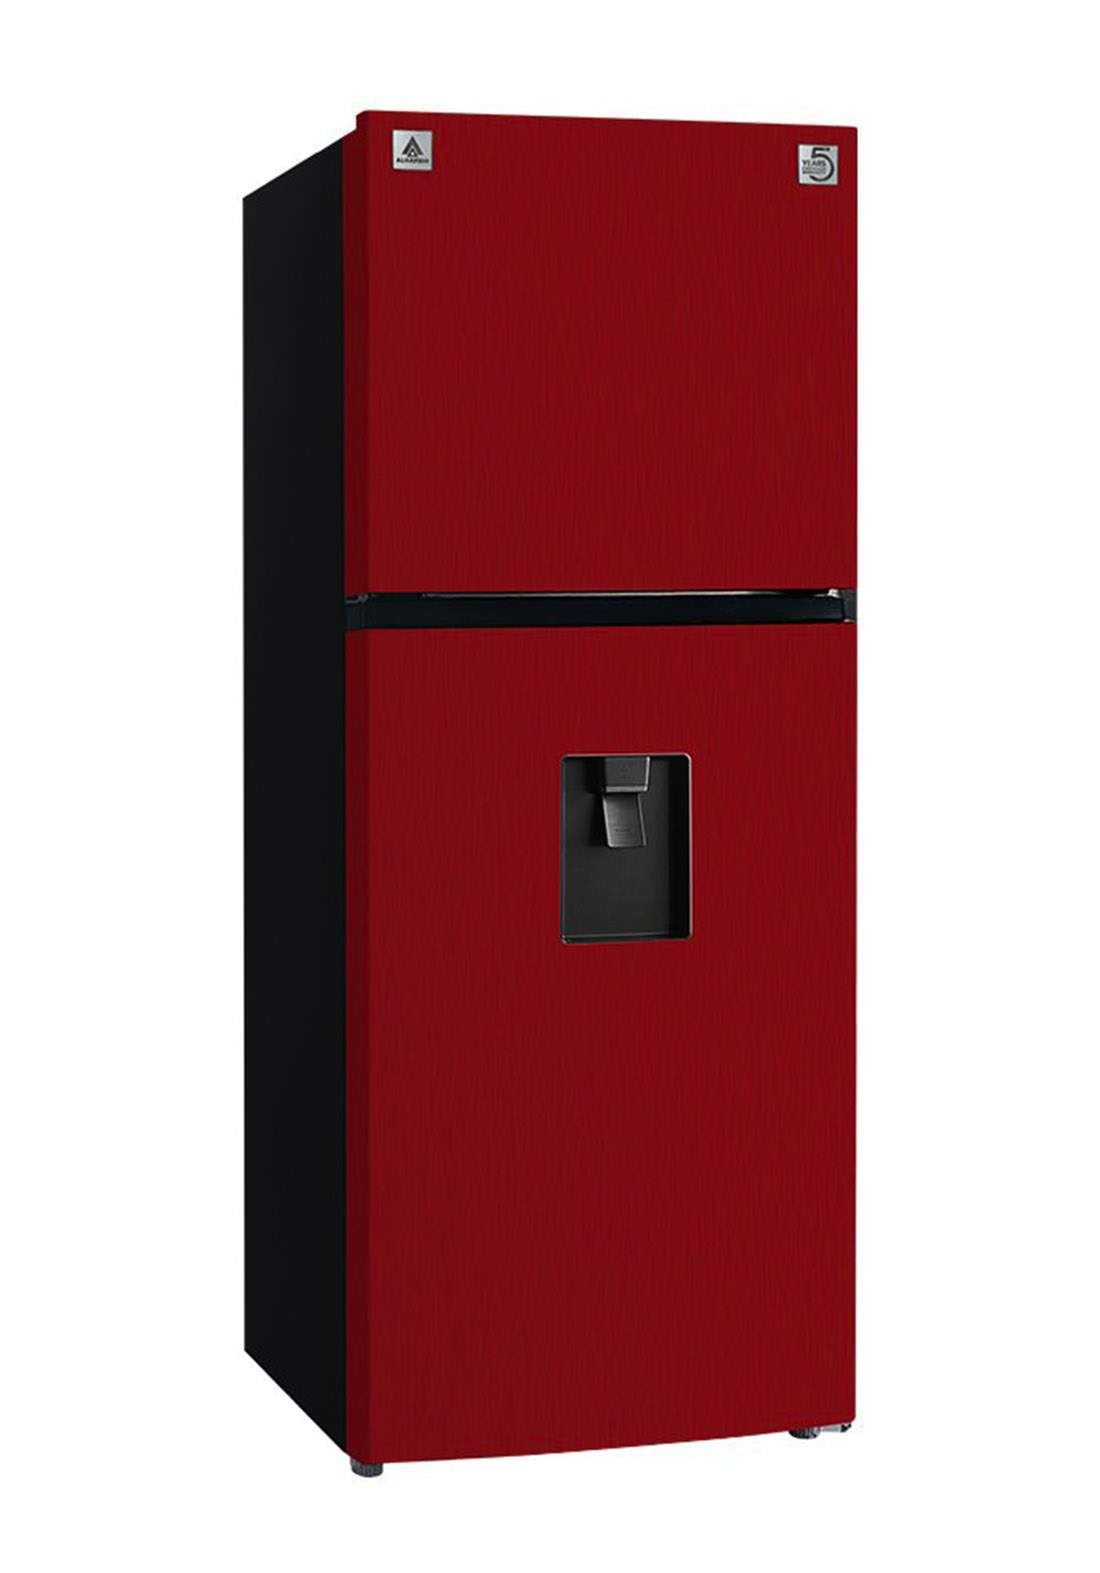 Alhafidh (RFHA-TM585DCR) 20cu.Ft. Direct Cool Top Mount Refrigerator ثلاجة بابين